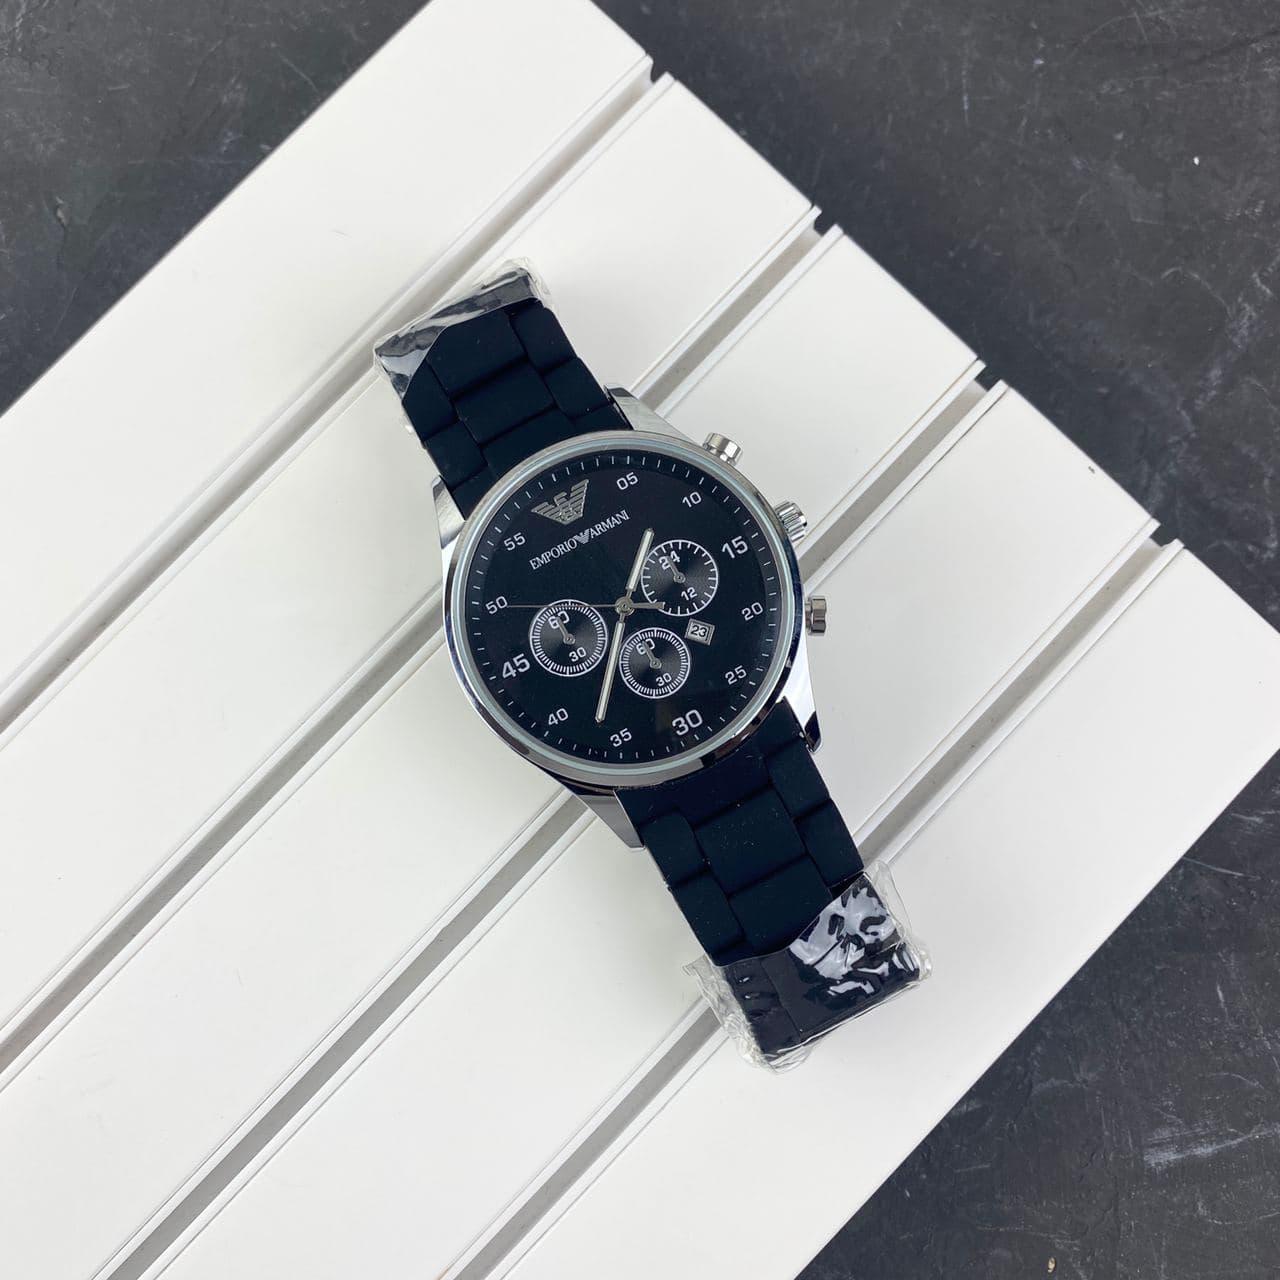 Мужские наручные часы Emporio Armani Silicone 068 Silver-Black